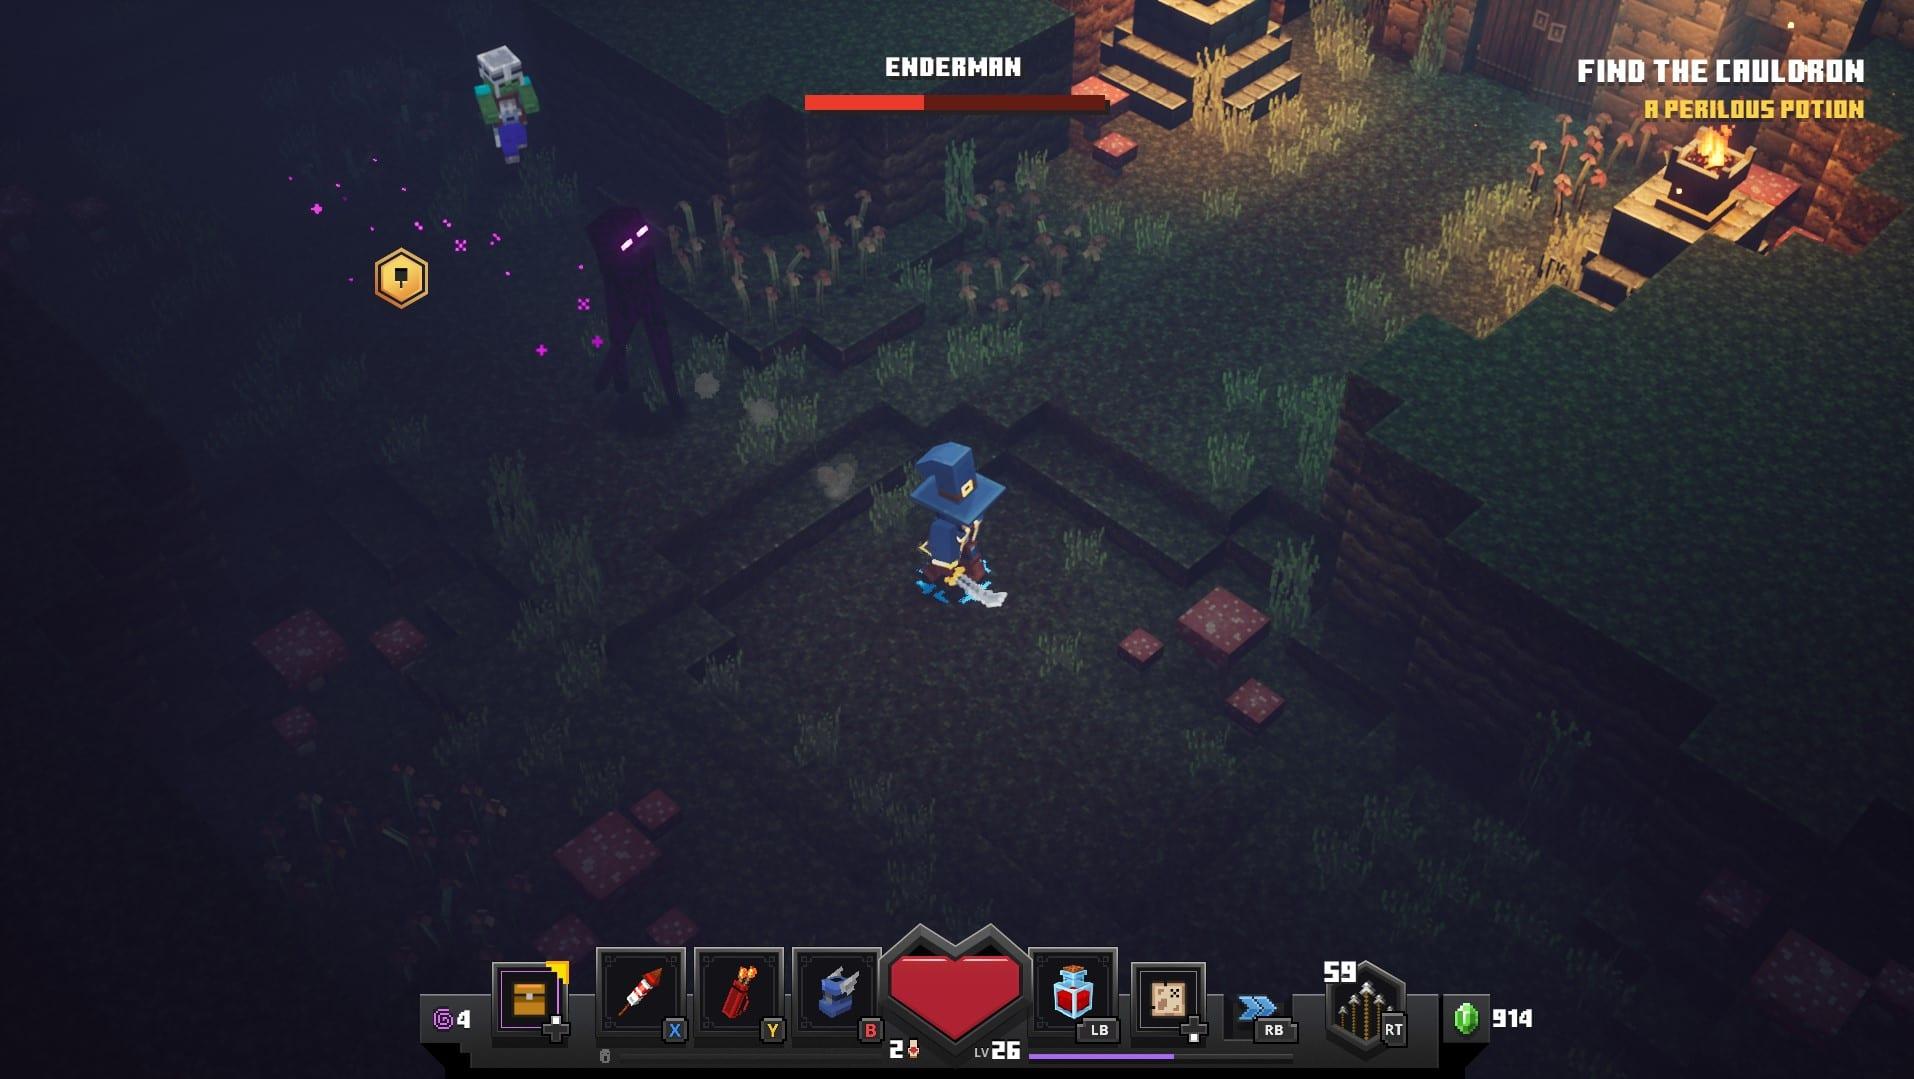 Minecraft mazmorras endermen